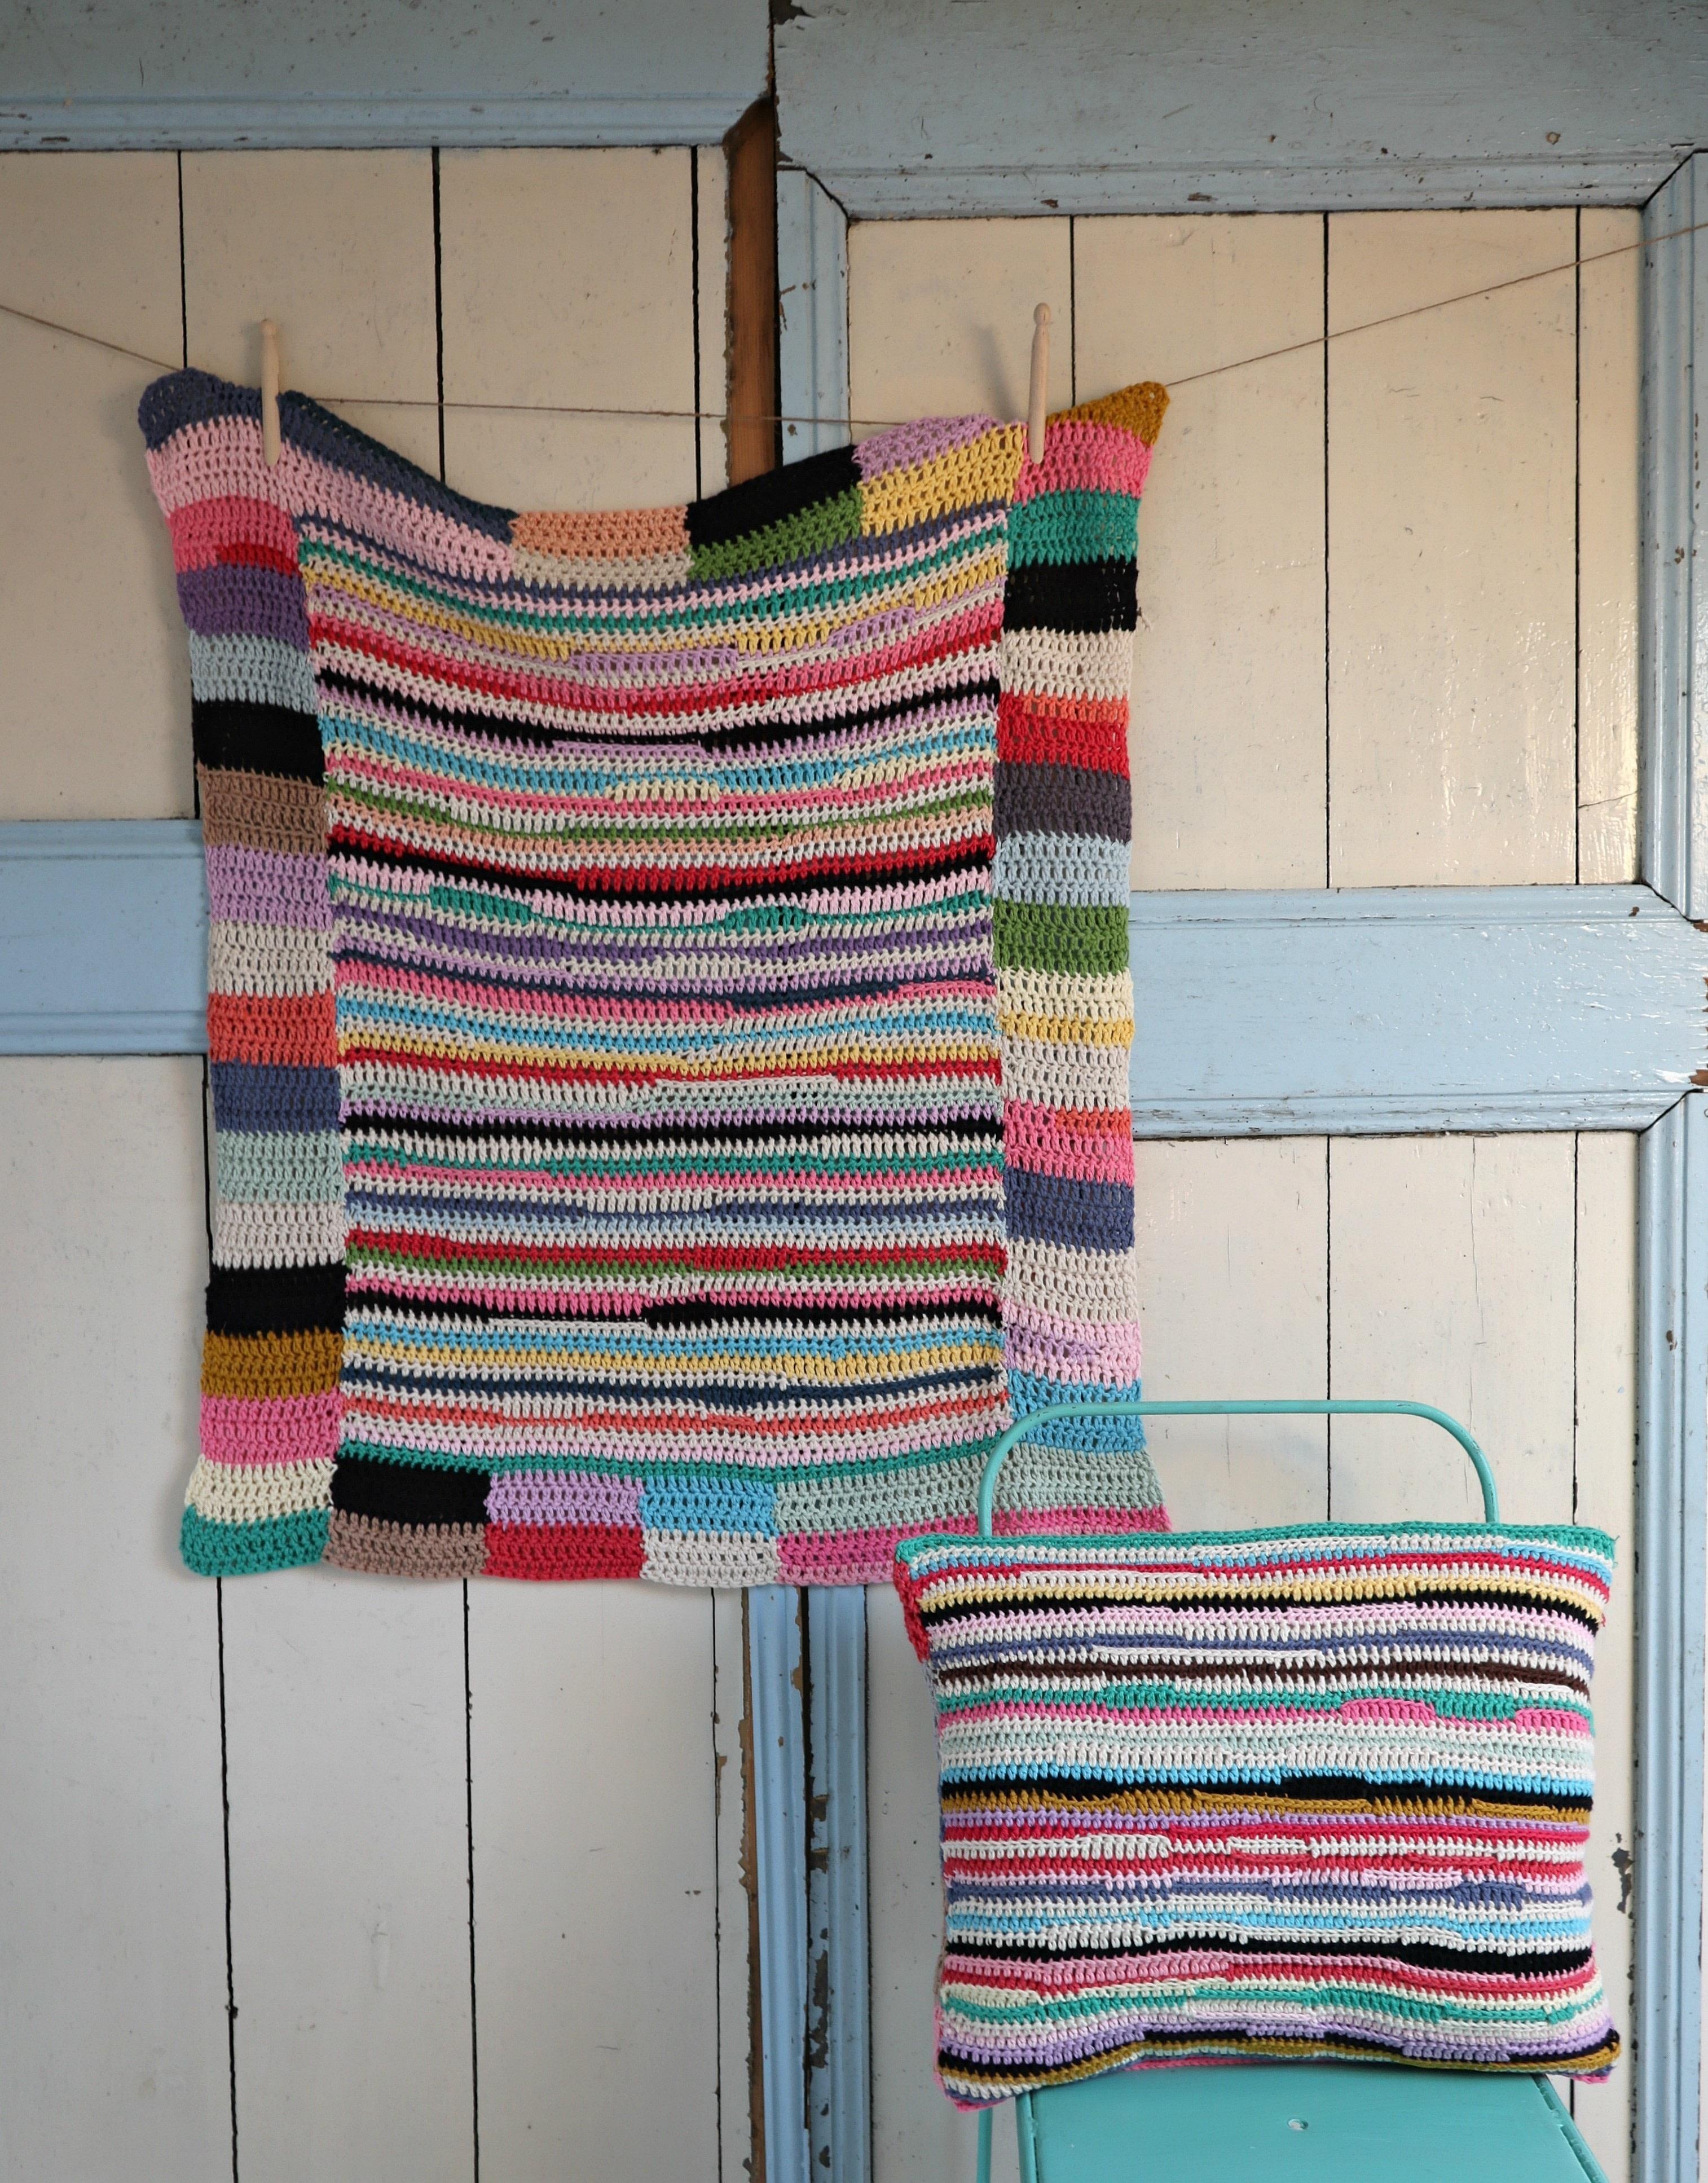 Shiraz Cushion · Extract from Stripy Blankets to Crochet by Haafner ...